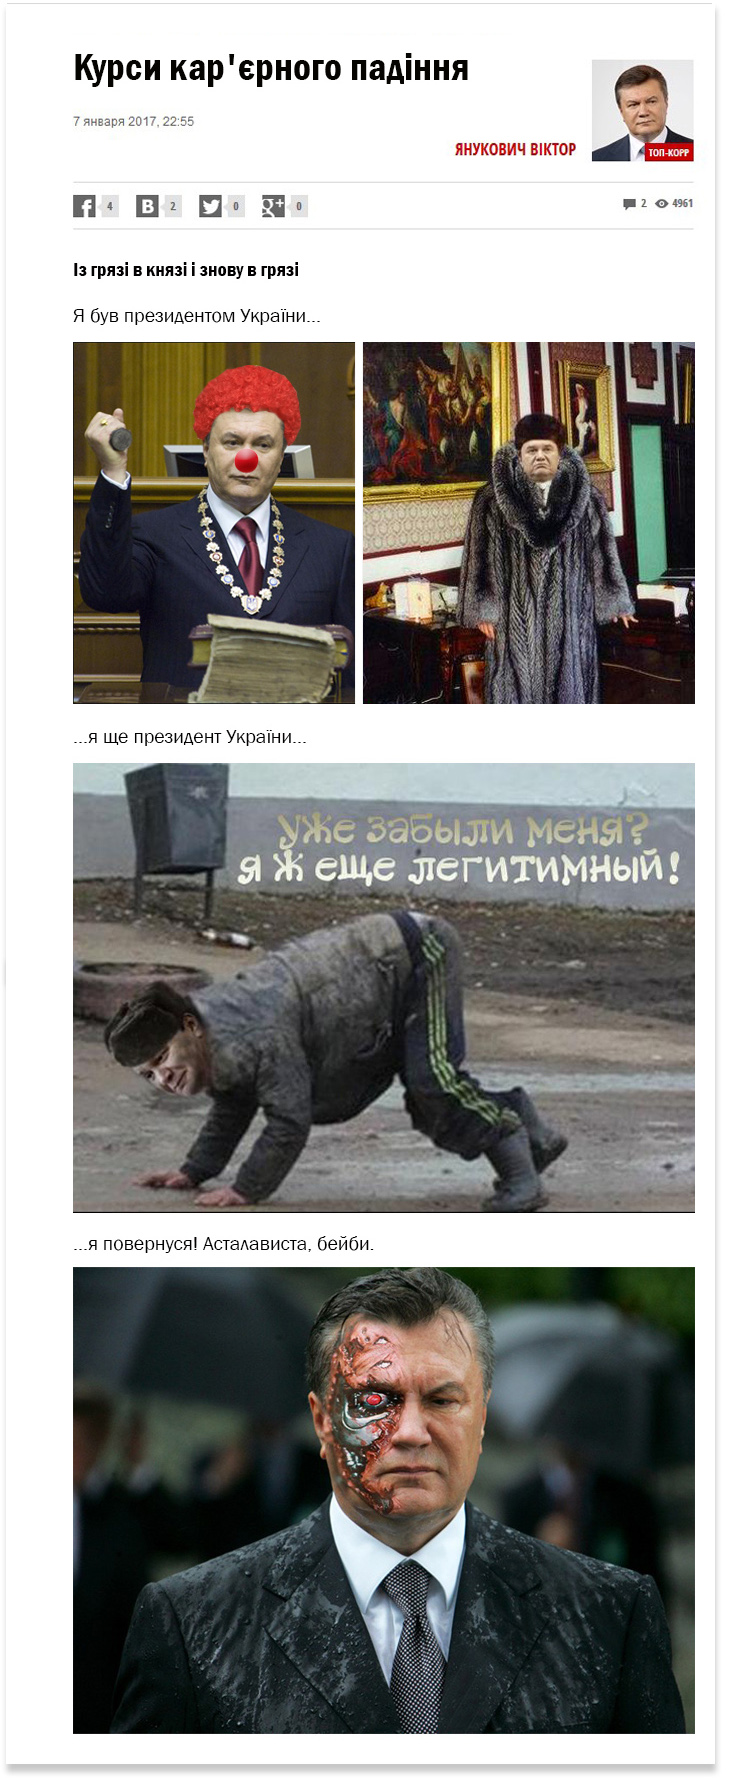 Як спекти золотий батон: блог Януковича у ФОТОЖАБАХ - фото 4